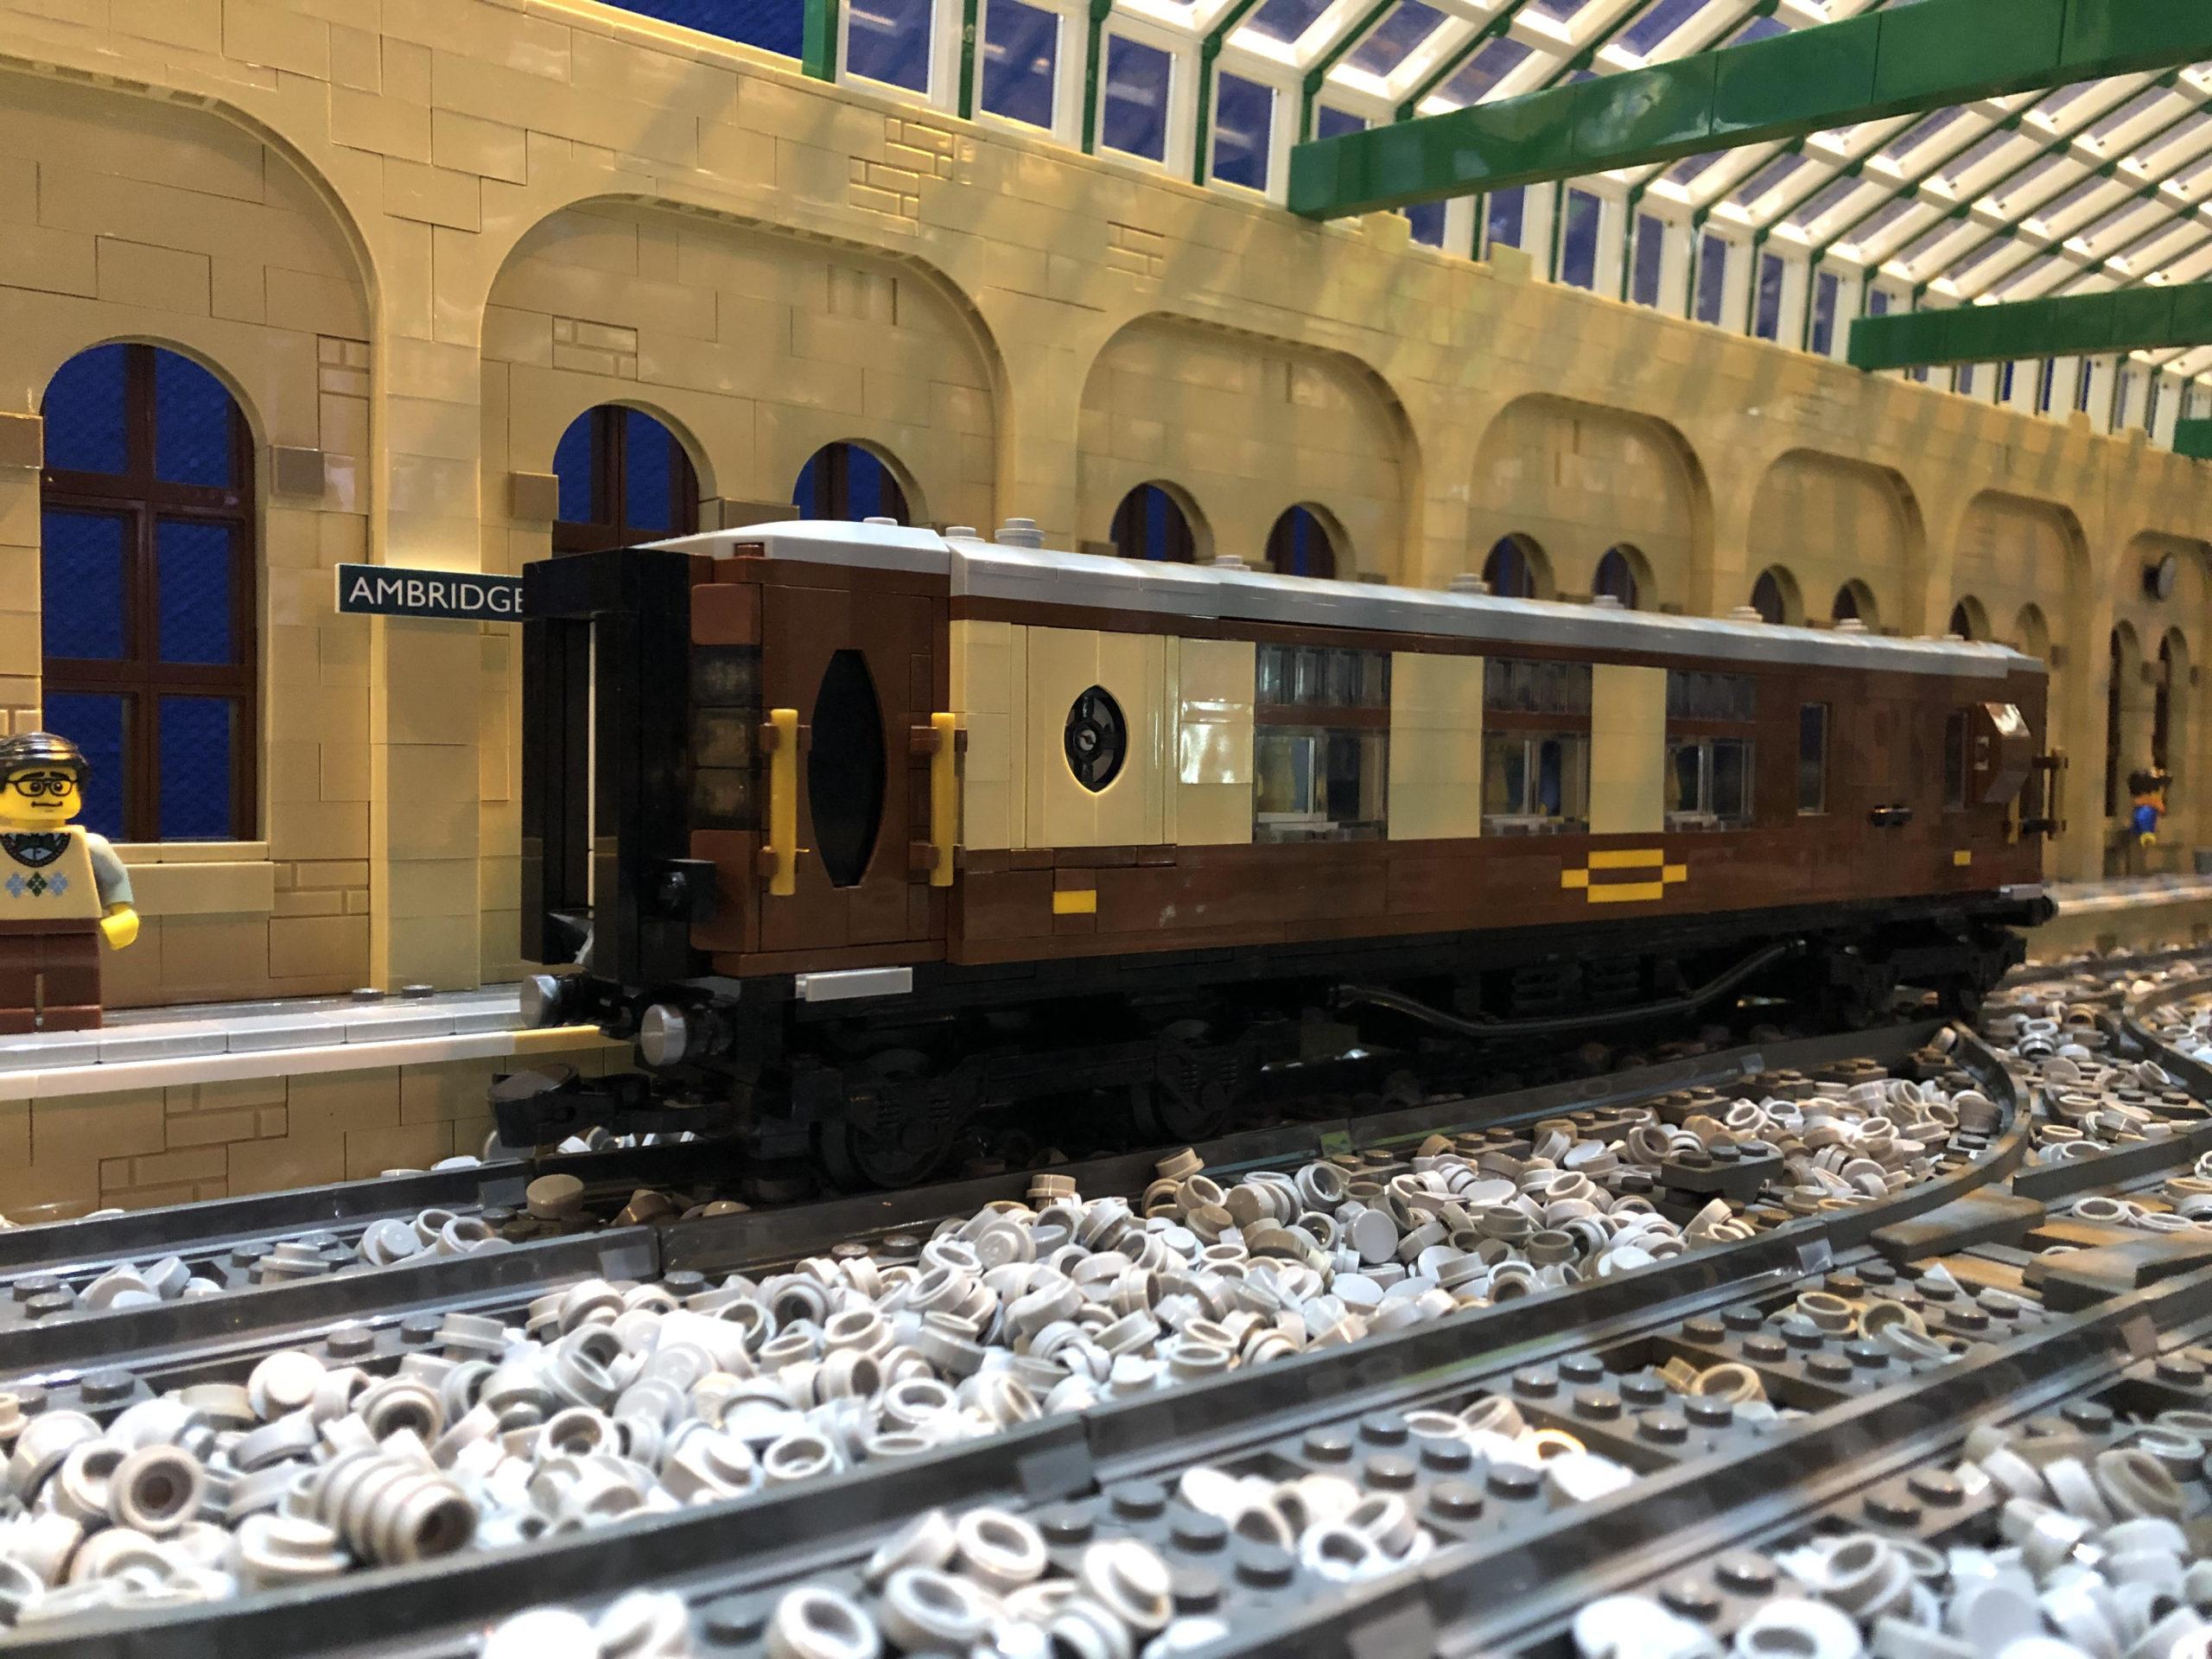 LEGO model of Pullman parlour brake carriage